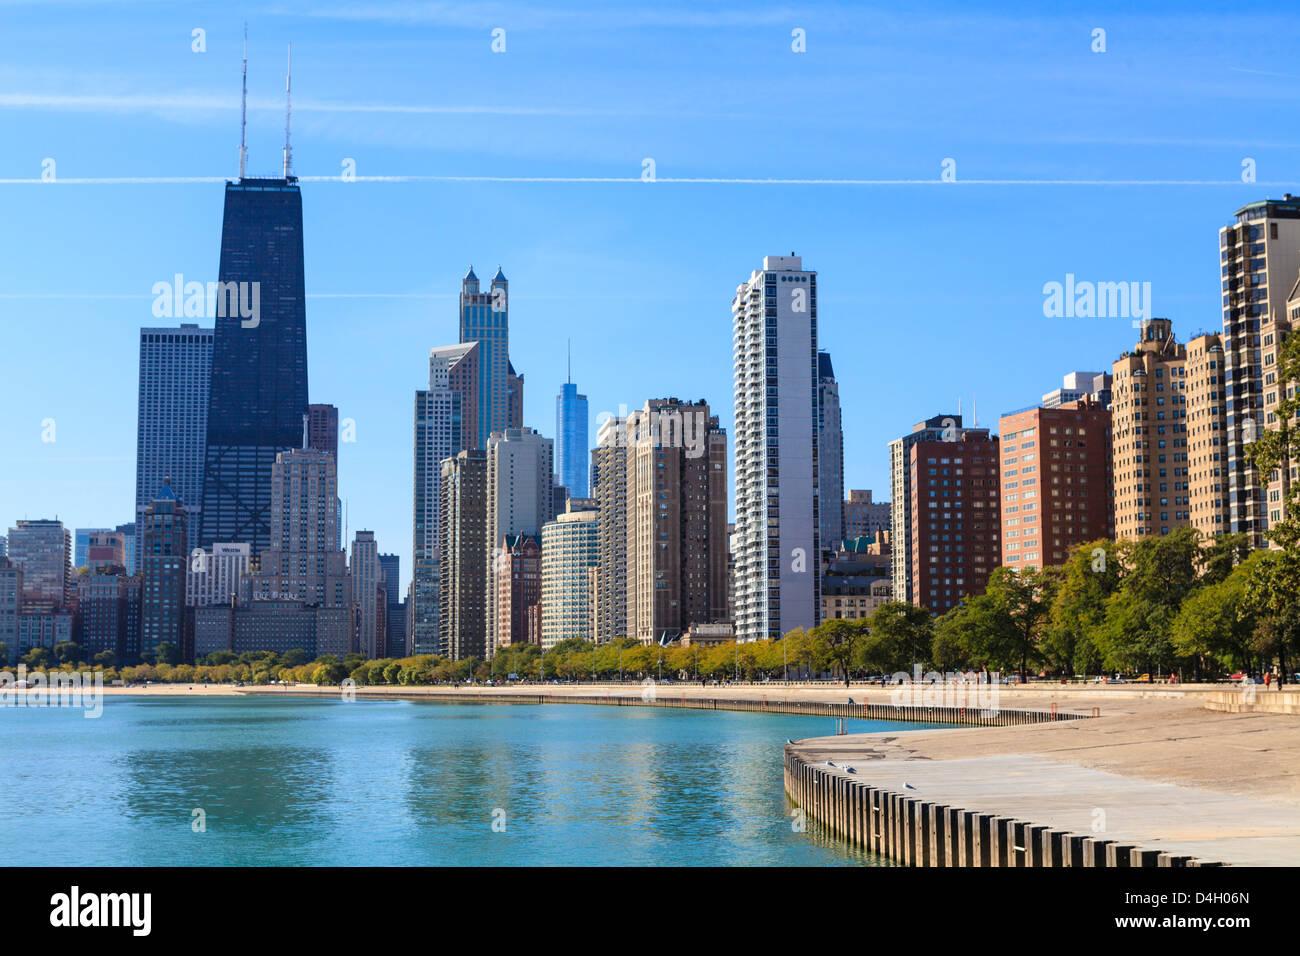 Chicago cityscape from North Avenue Beach, John Hancock Center on the left, Chicago, Illinois, USA - Stock Image